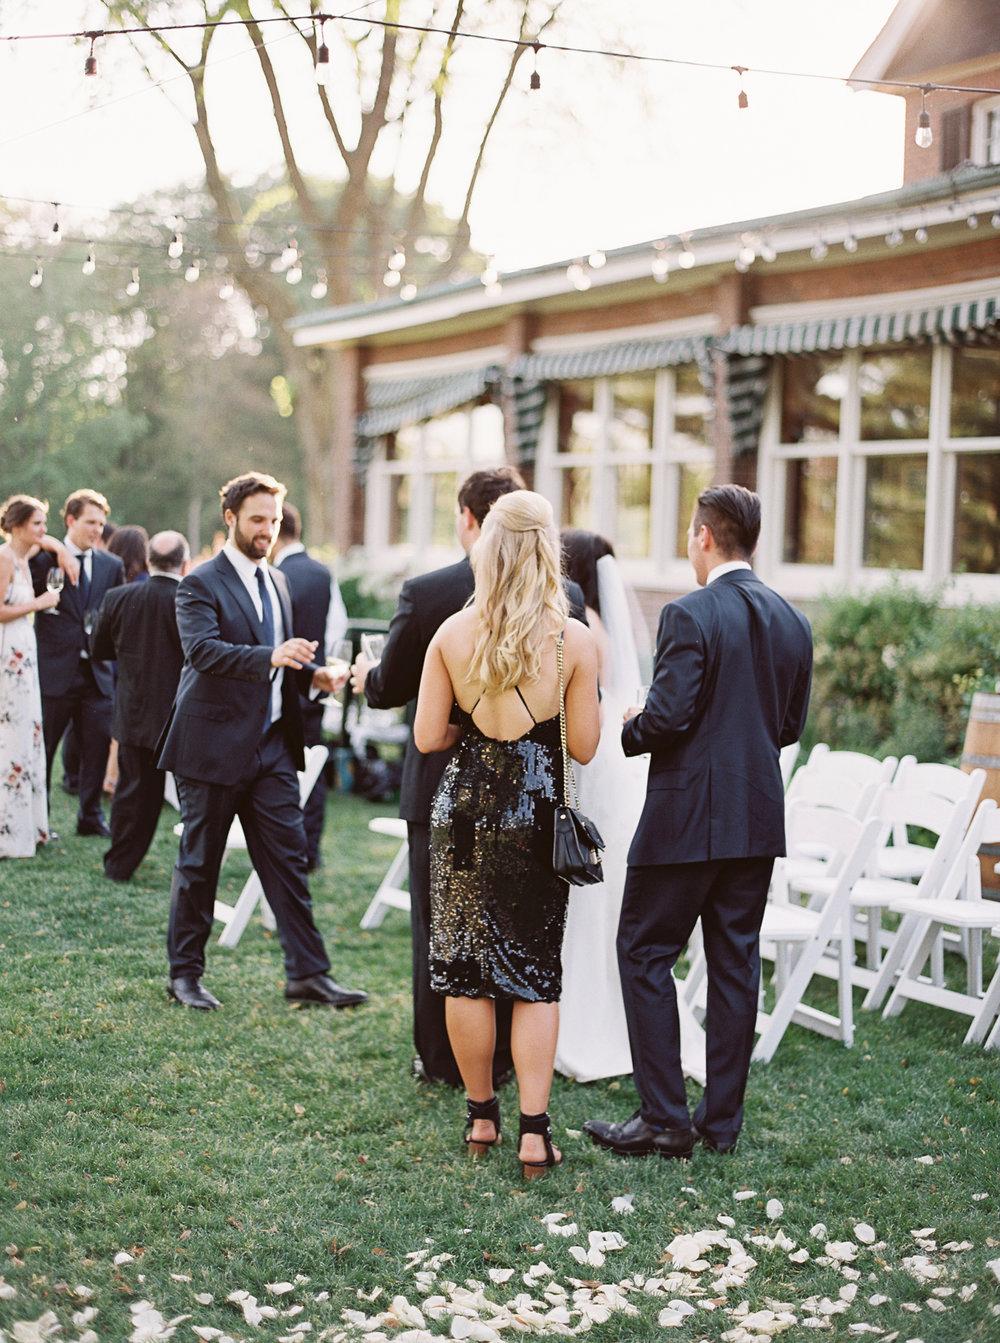 0285-Nadia-Chris-Married-When He Founf Her-Toronto Golf Club.jpg